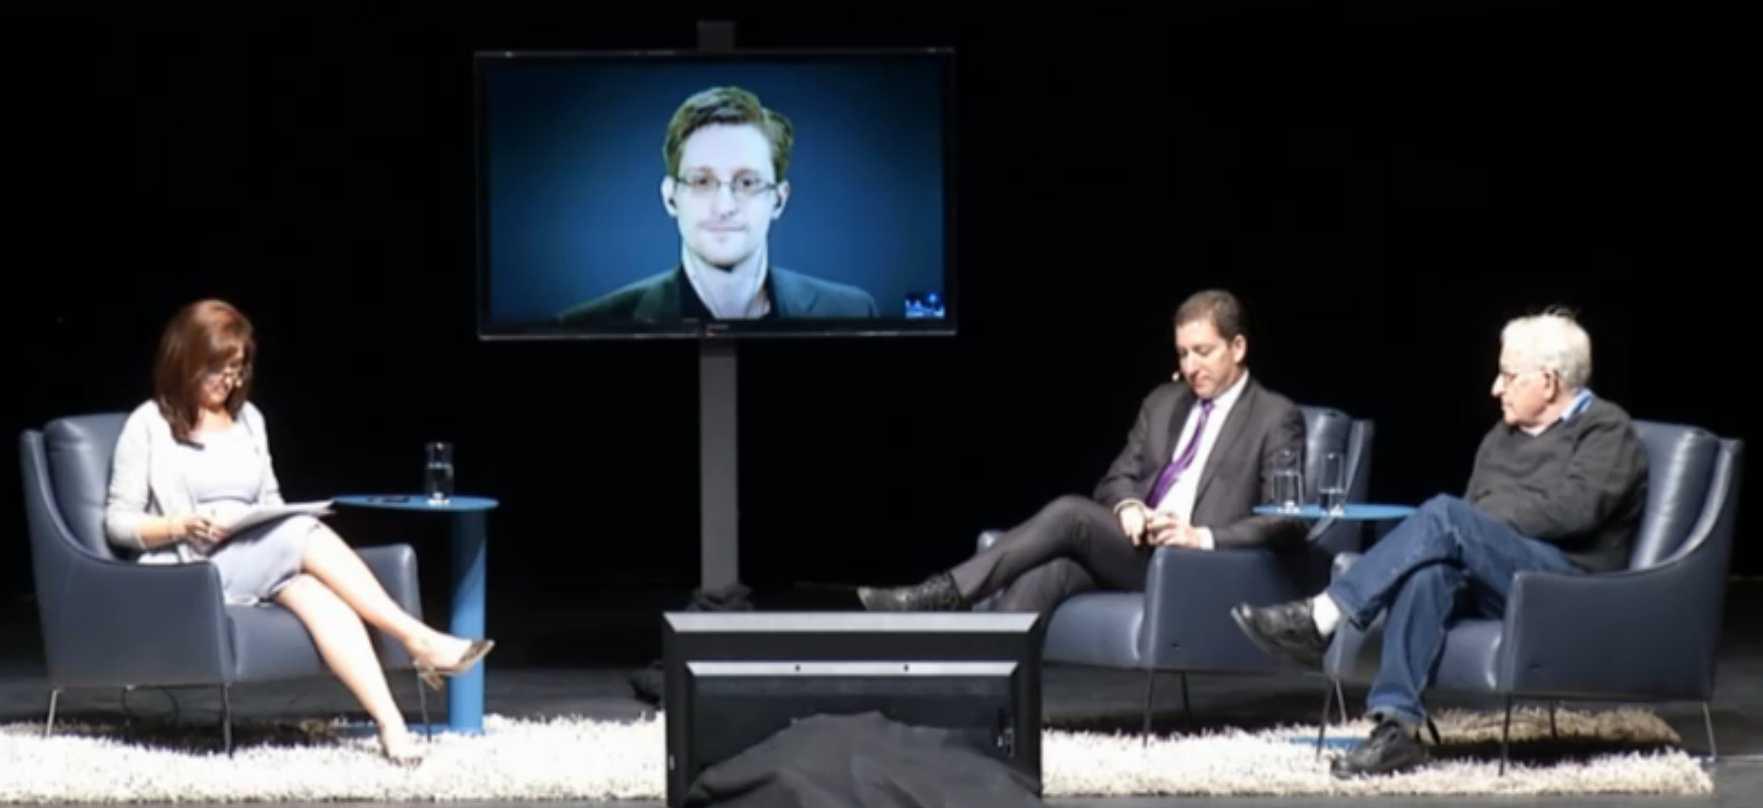 Nuala O?Connor, Edward Snowden, Glenn Greenwald, Noam Chomsky